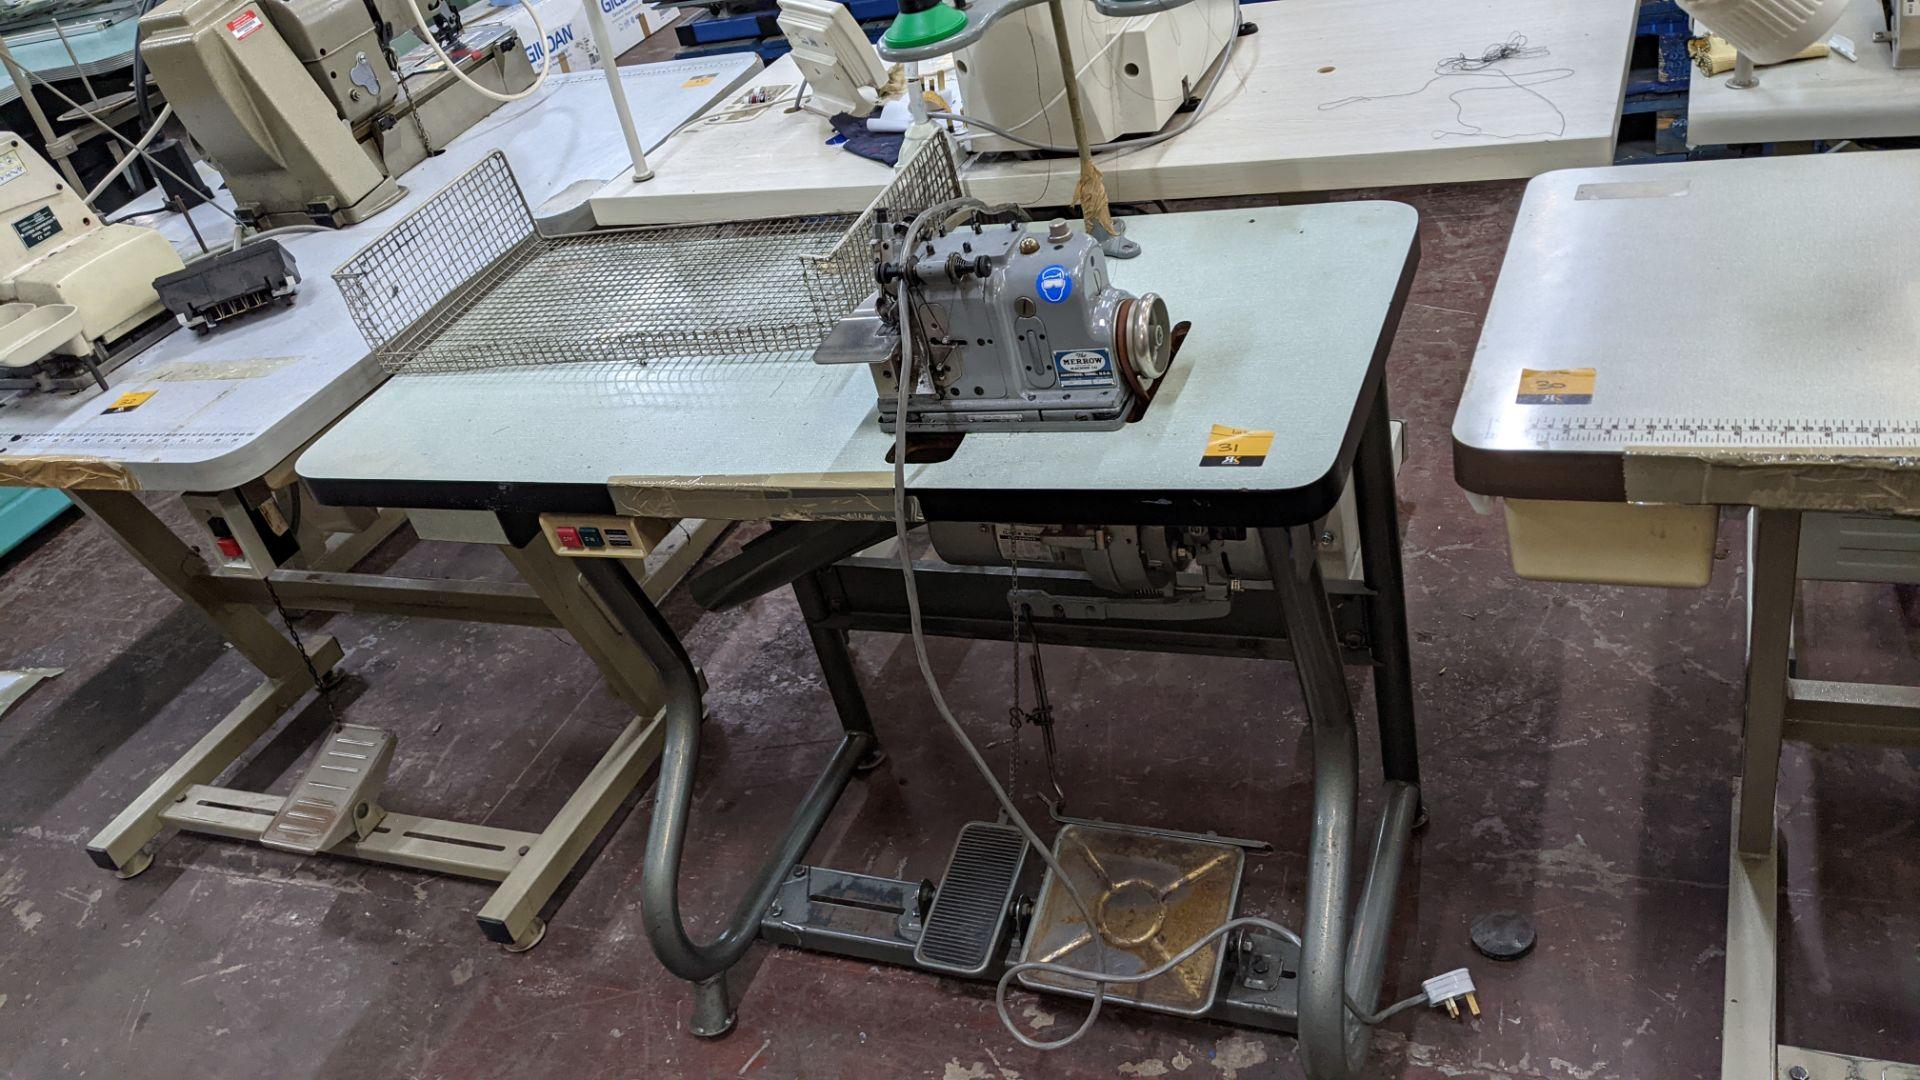 Merrow sewing machine, model M-30 - Image 2 of 14